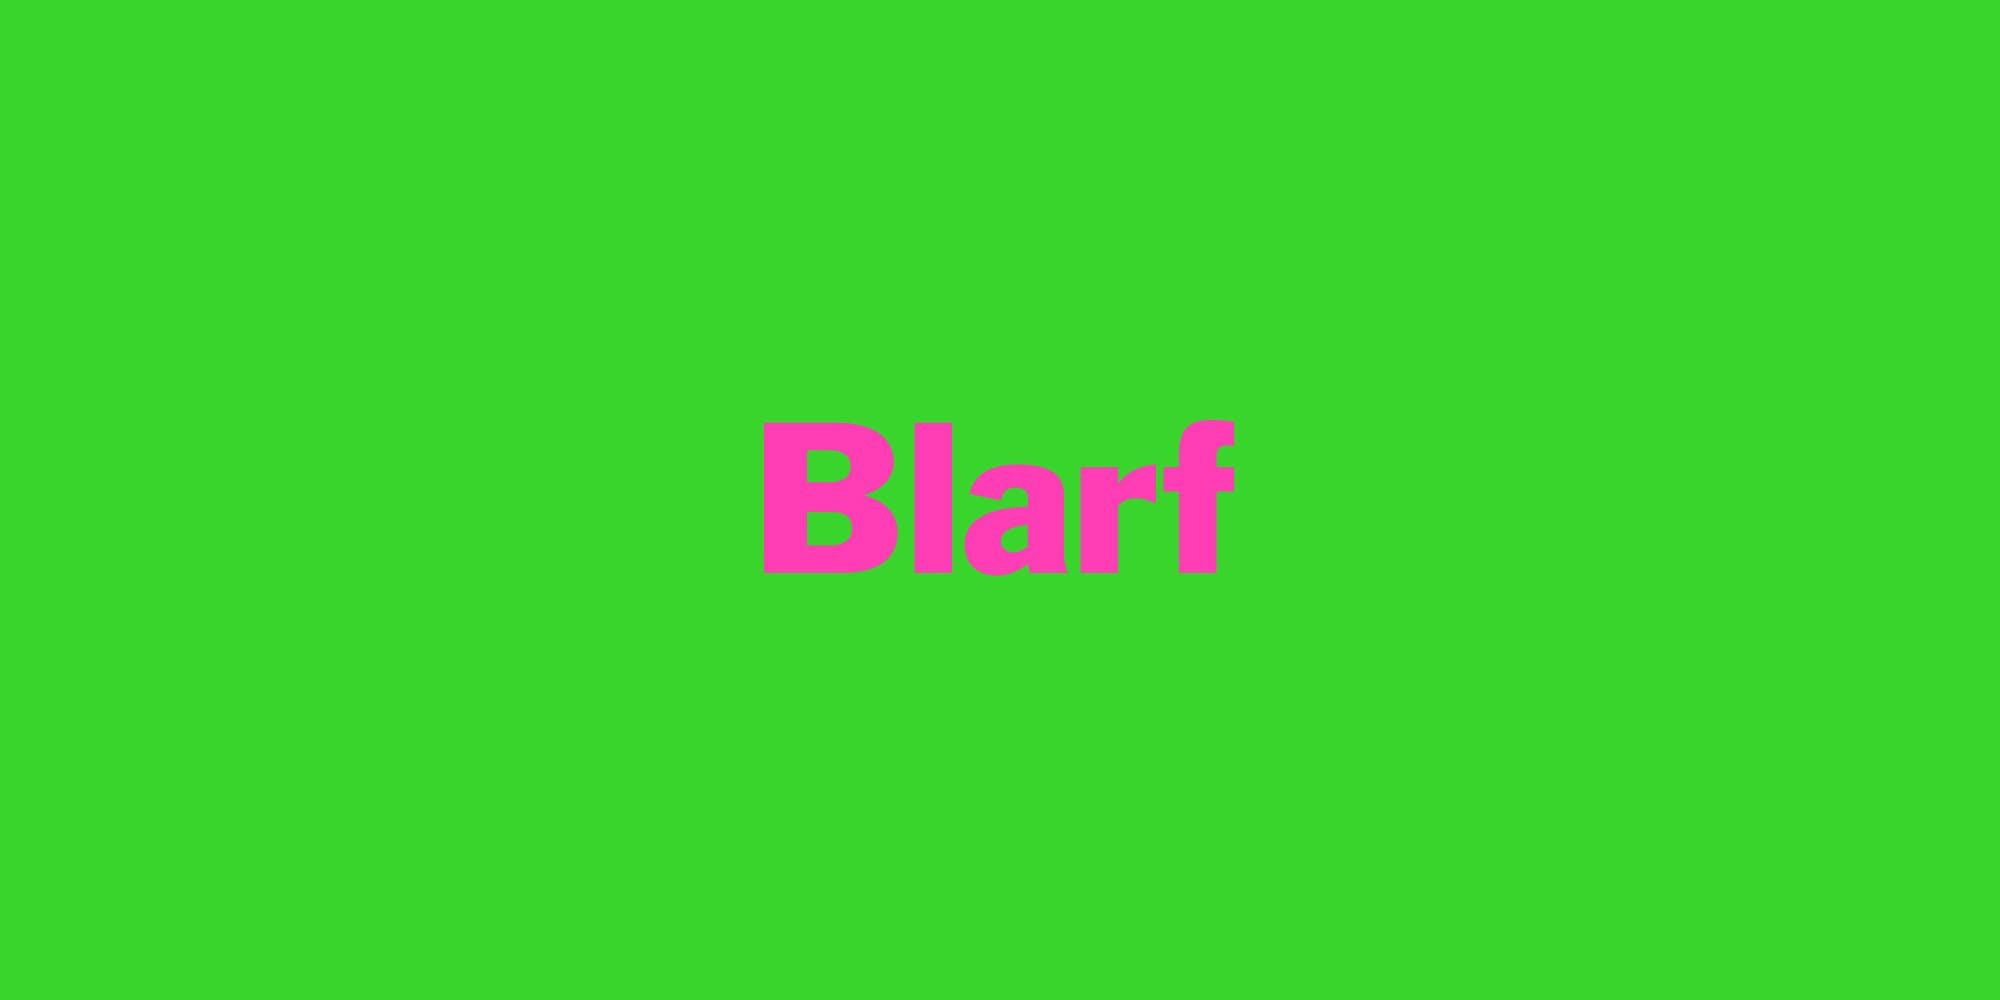 BLARF